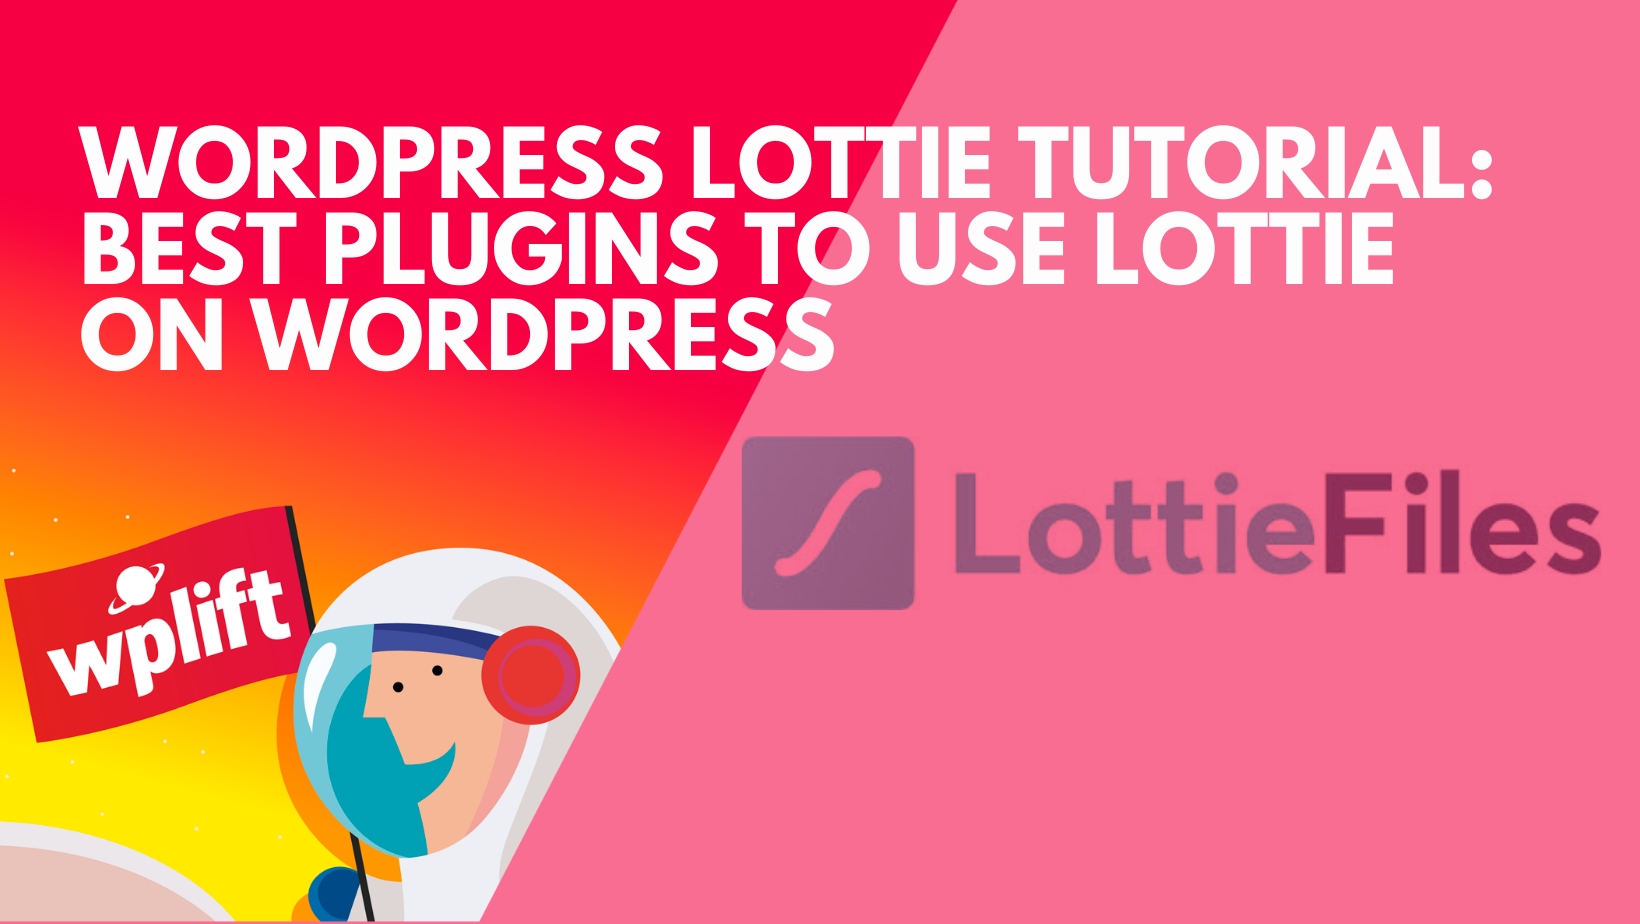 Best Plugins to Use Lottie on WordPress